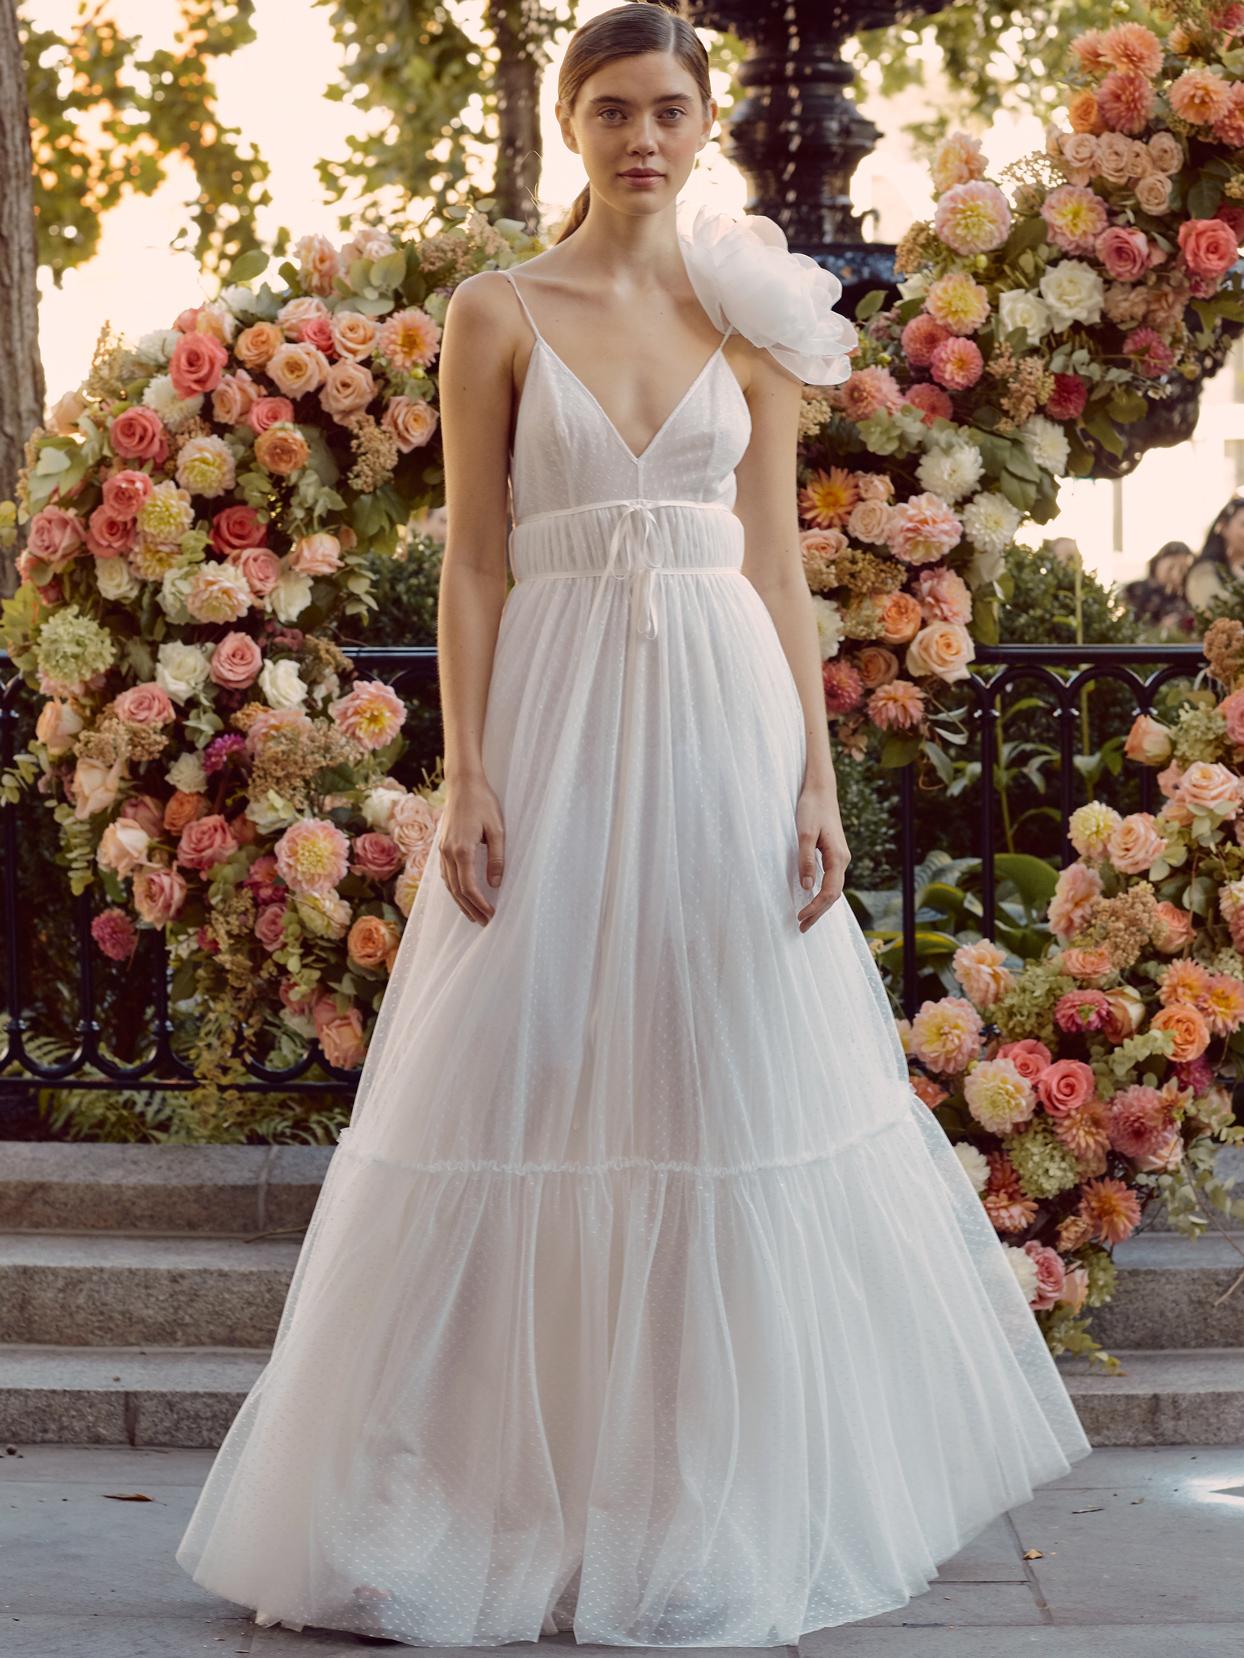 lela rose sheer spaghetti strap v-neck wedding dress with 3D floral detail fall 2020